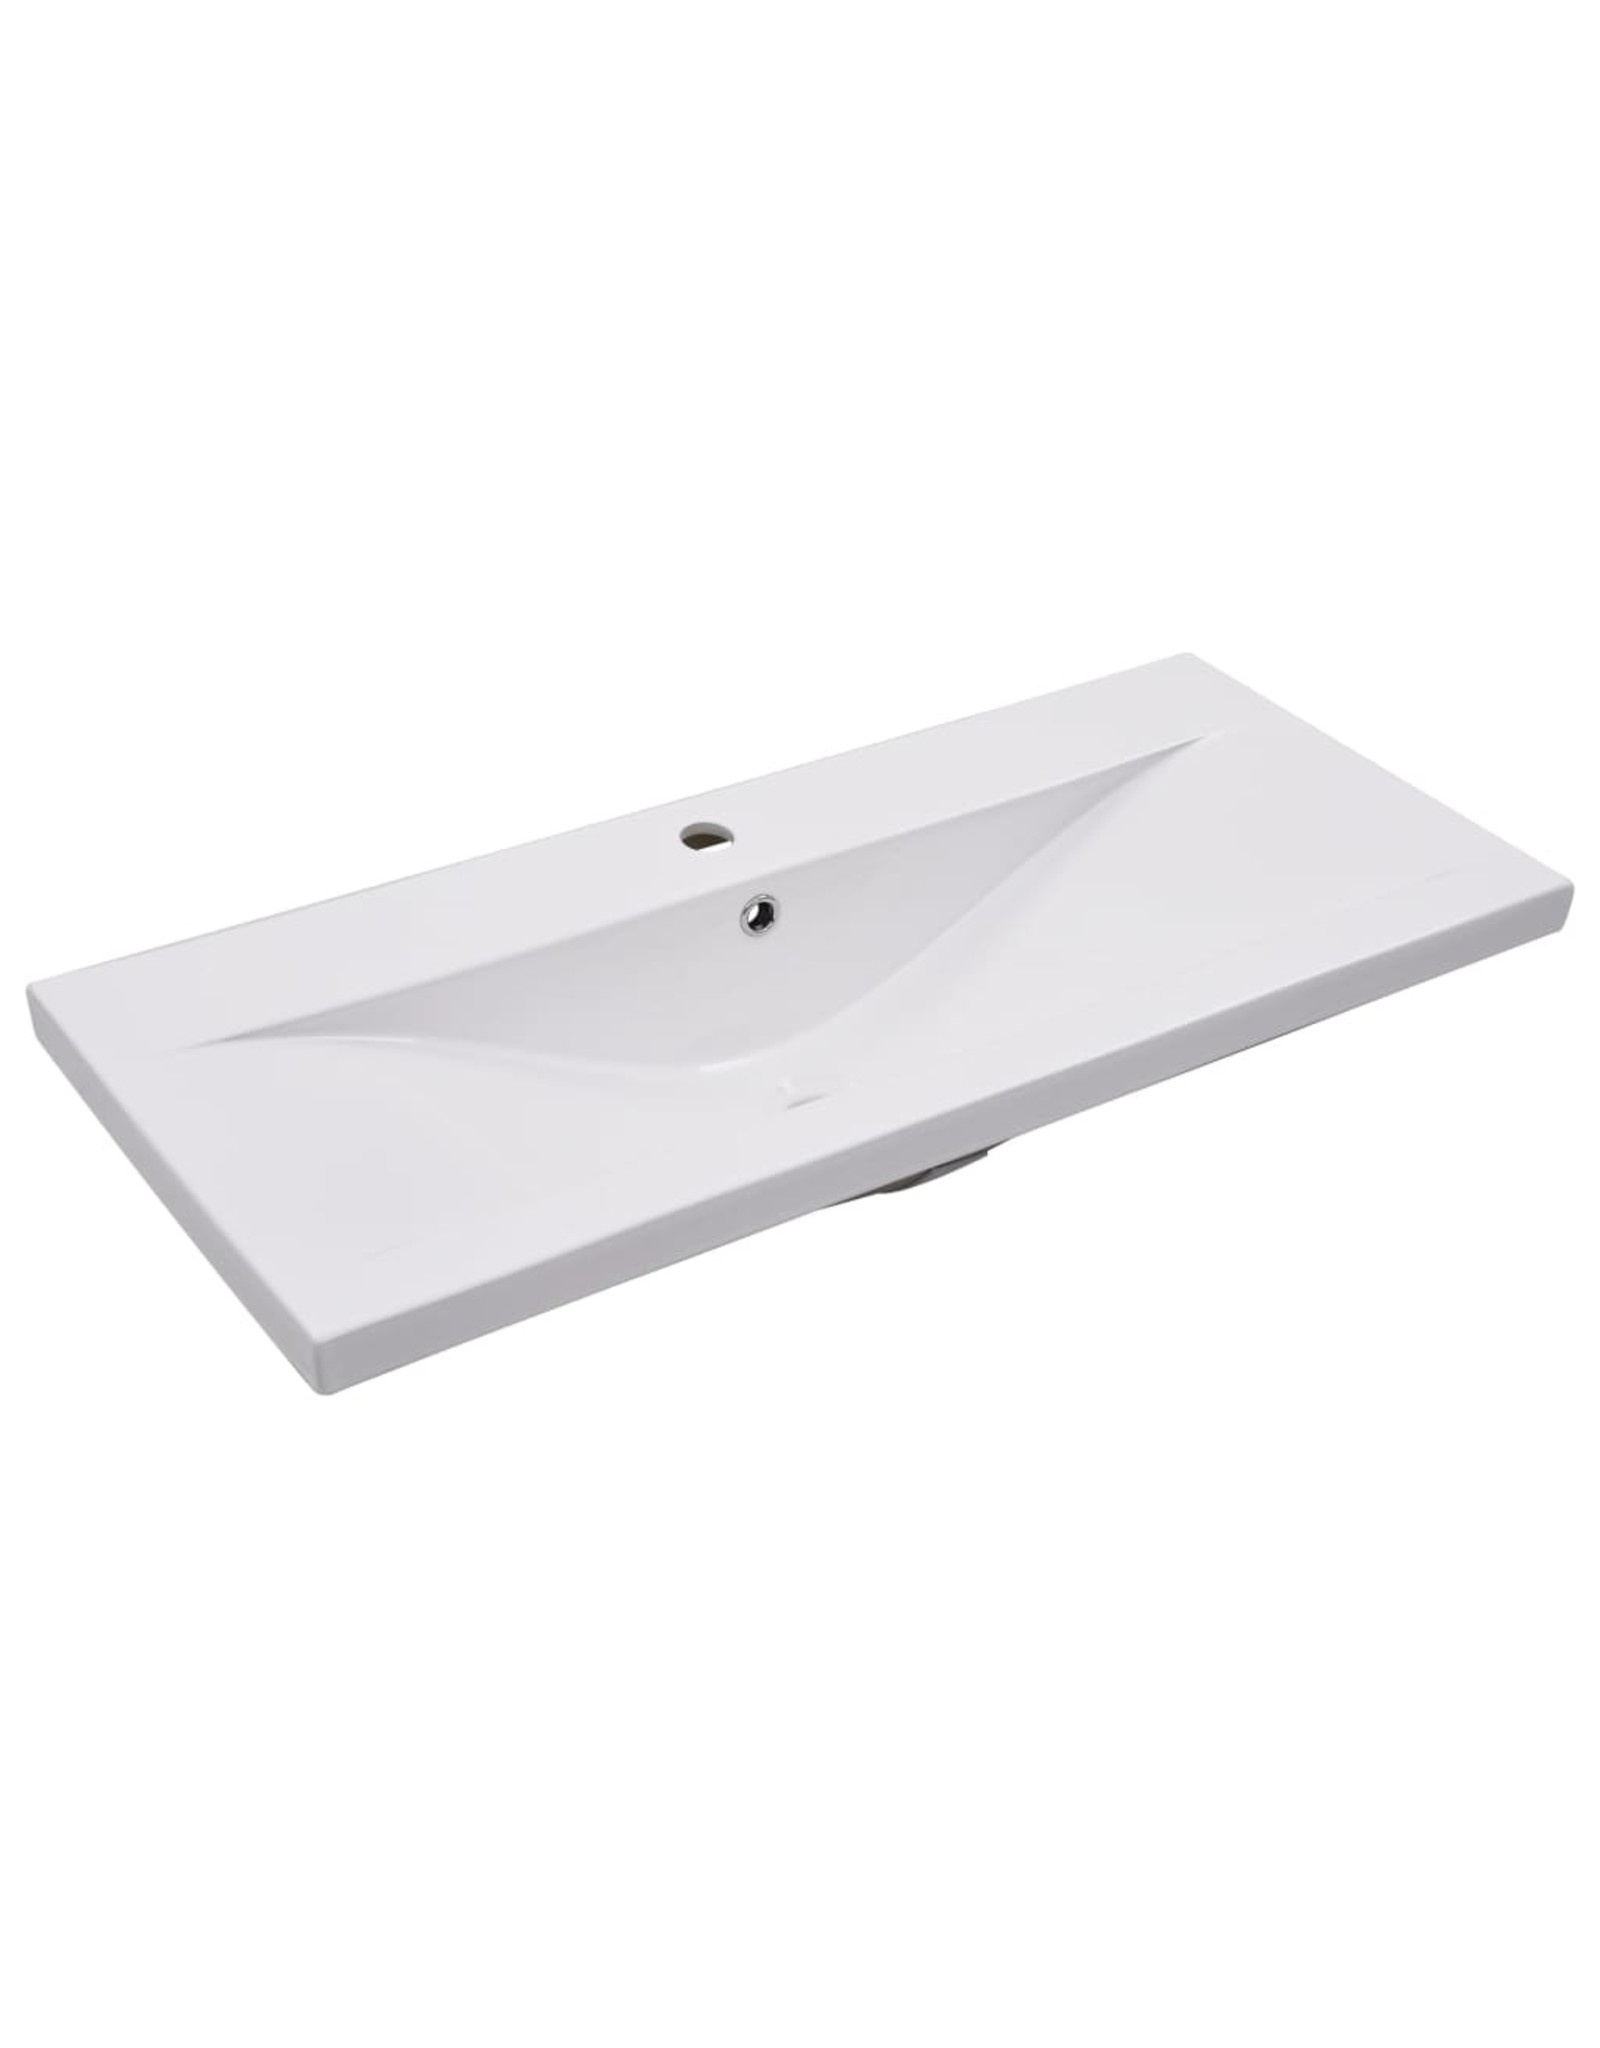 Inbouwwastafel 91x39,5x18,5 cm keramiek wit